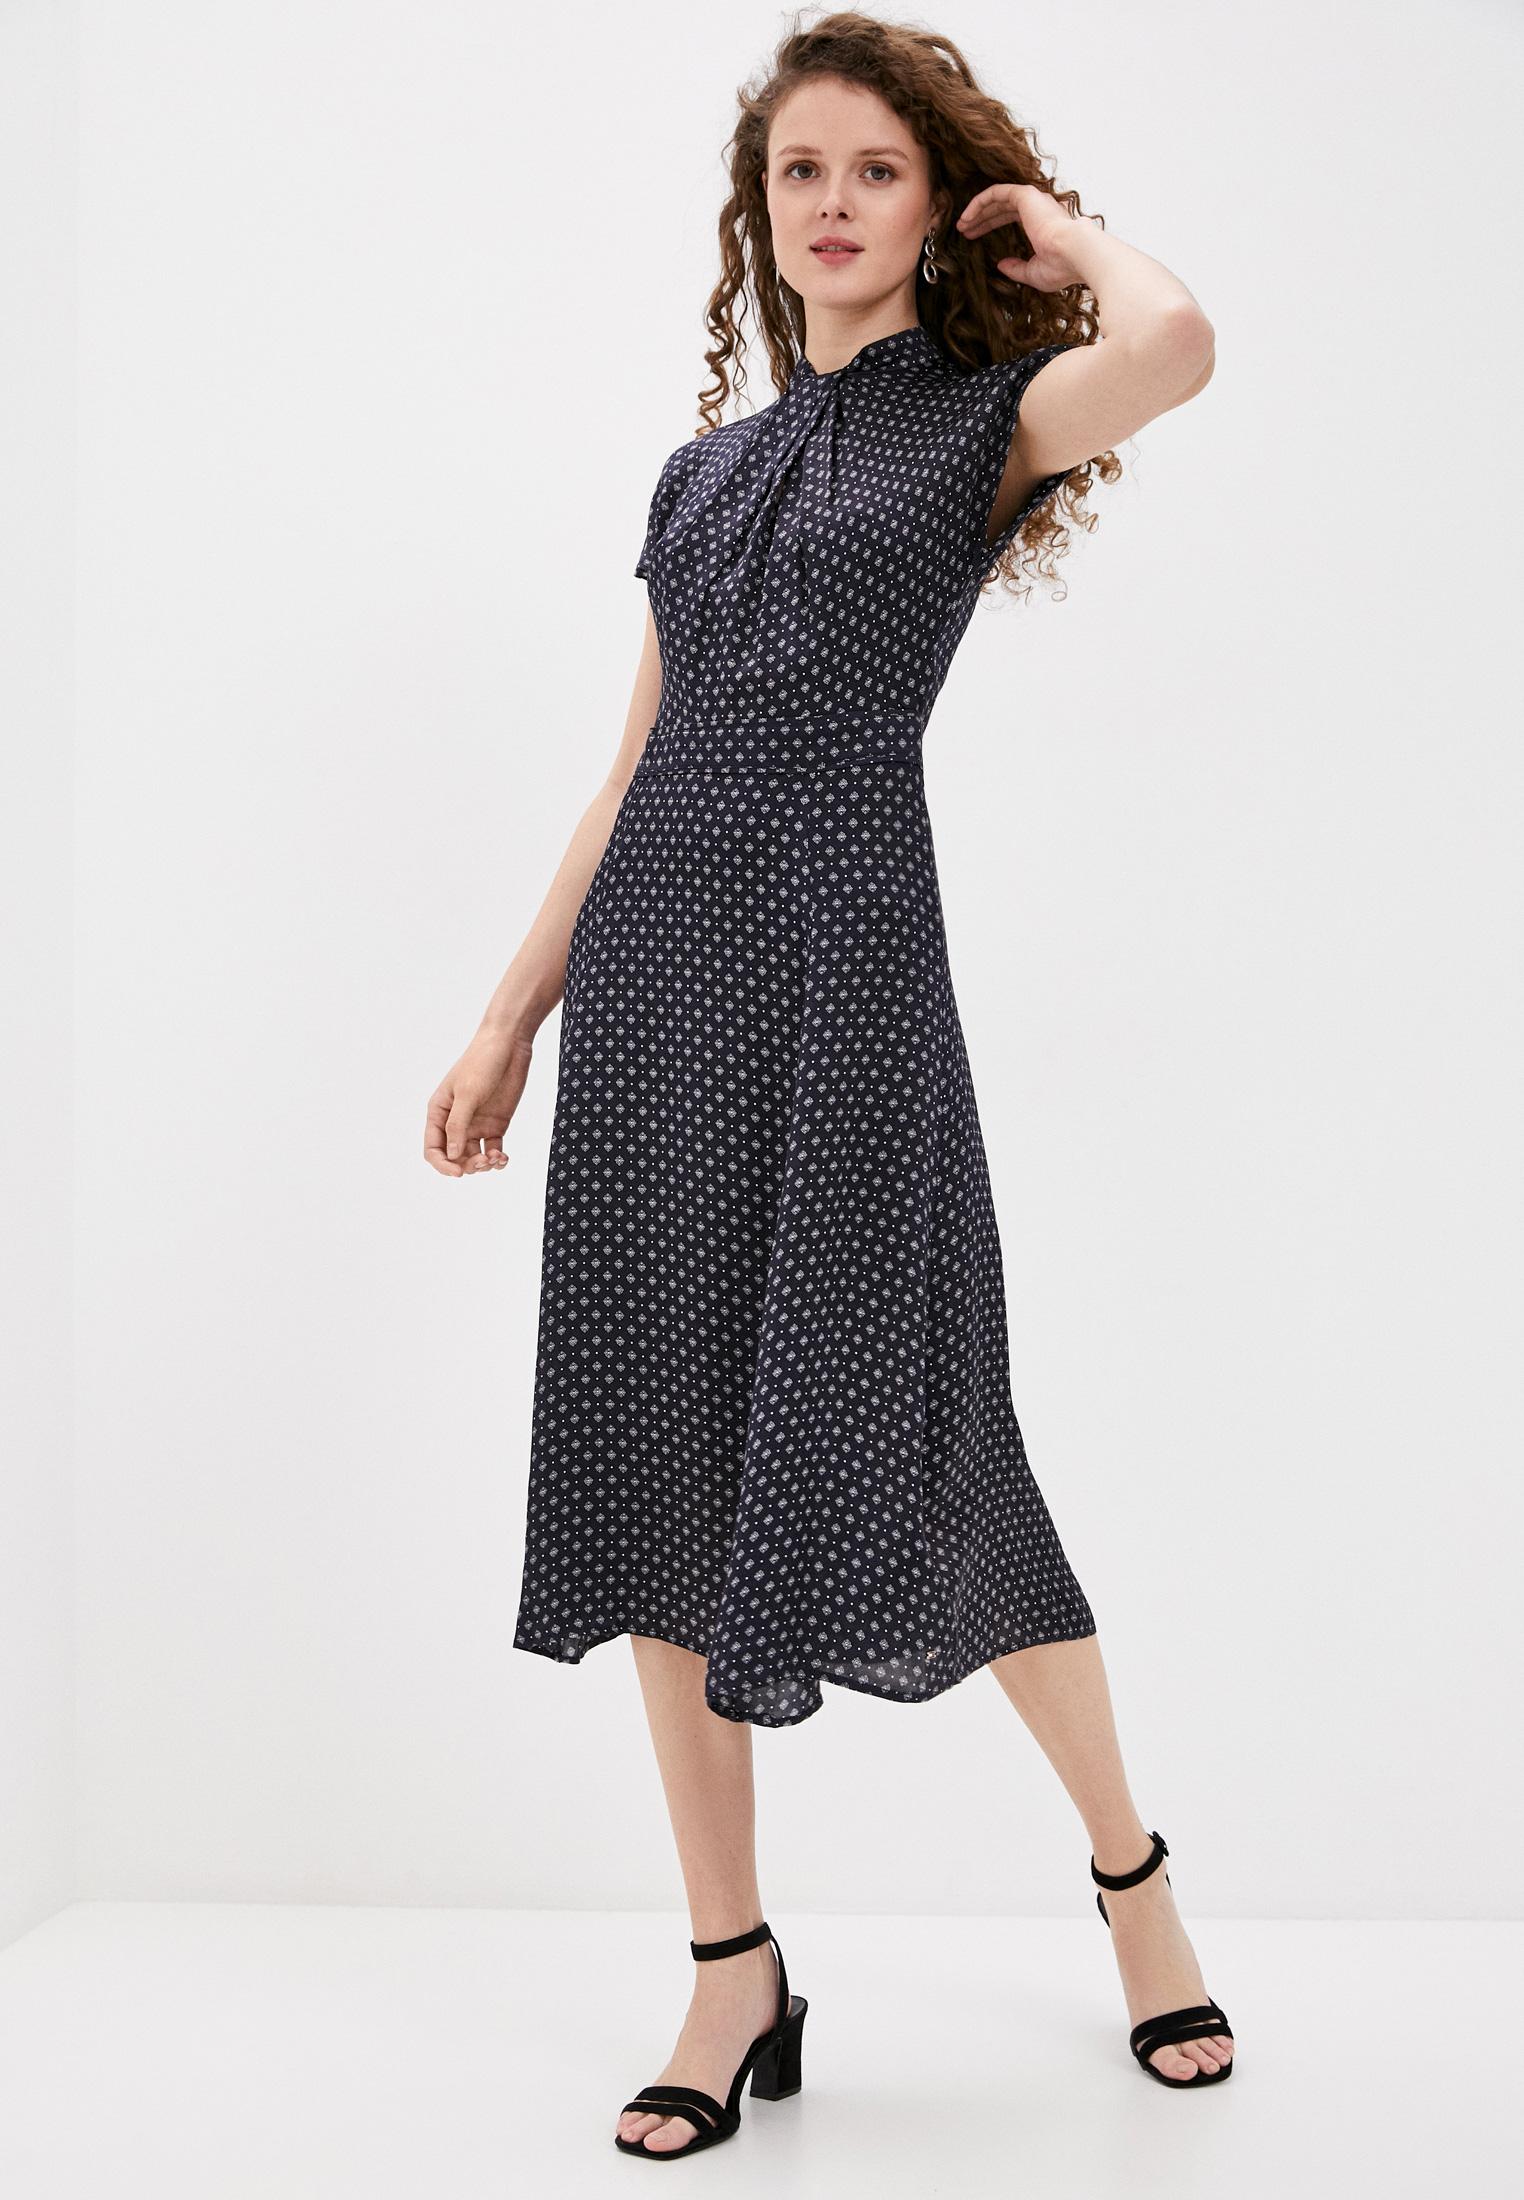 Платье Tommy Hilfiger (Томми Хилфигер) WW0WW31101